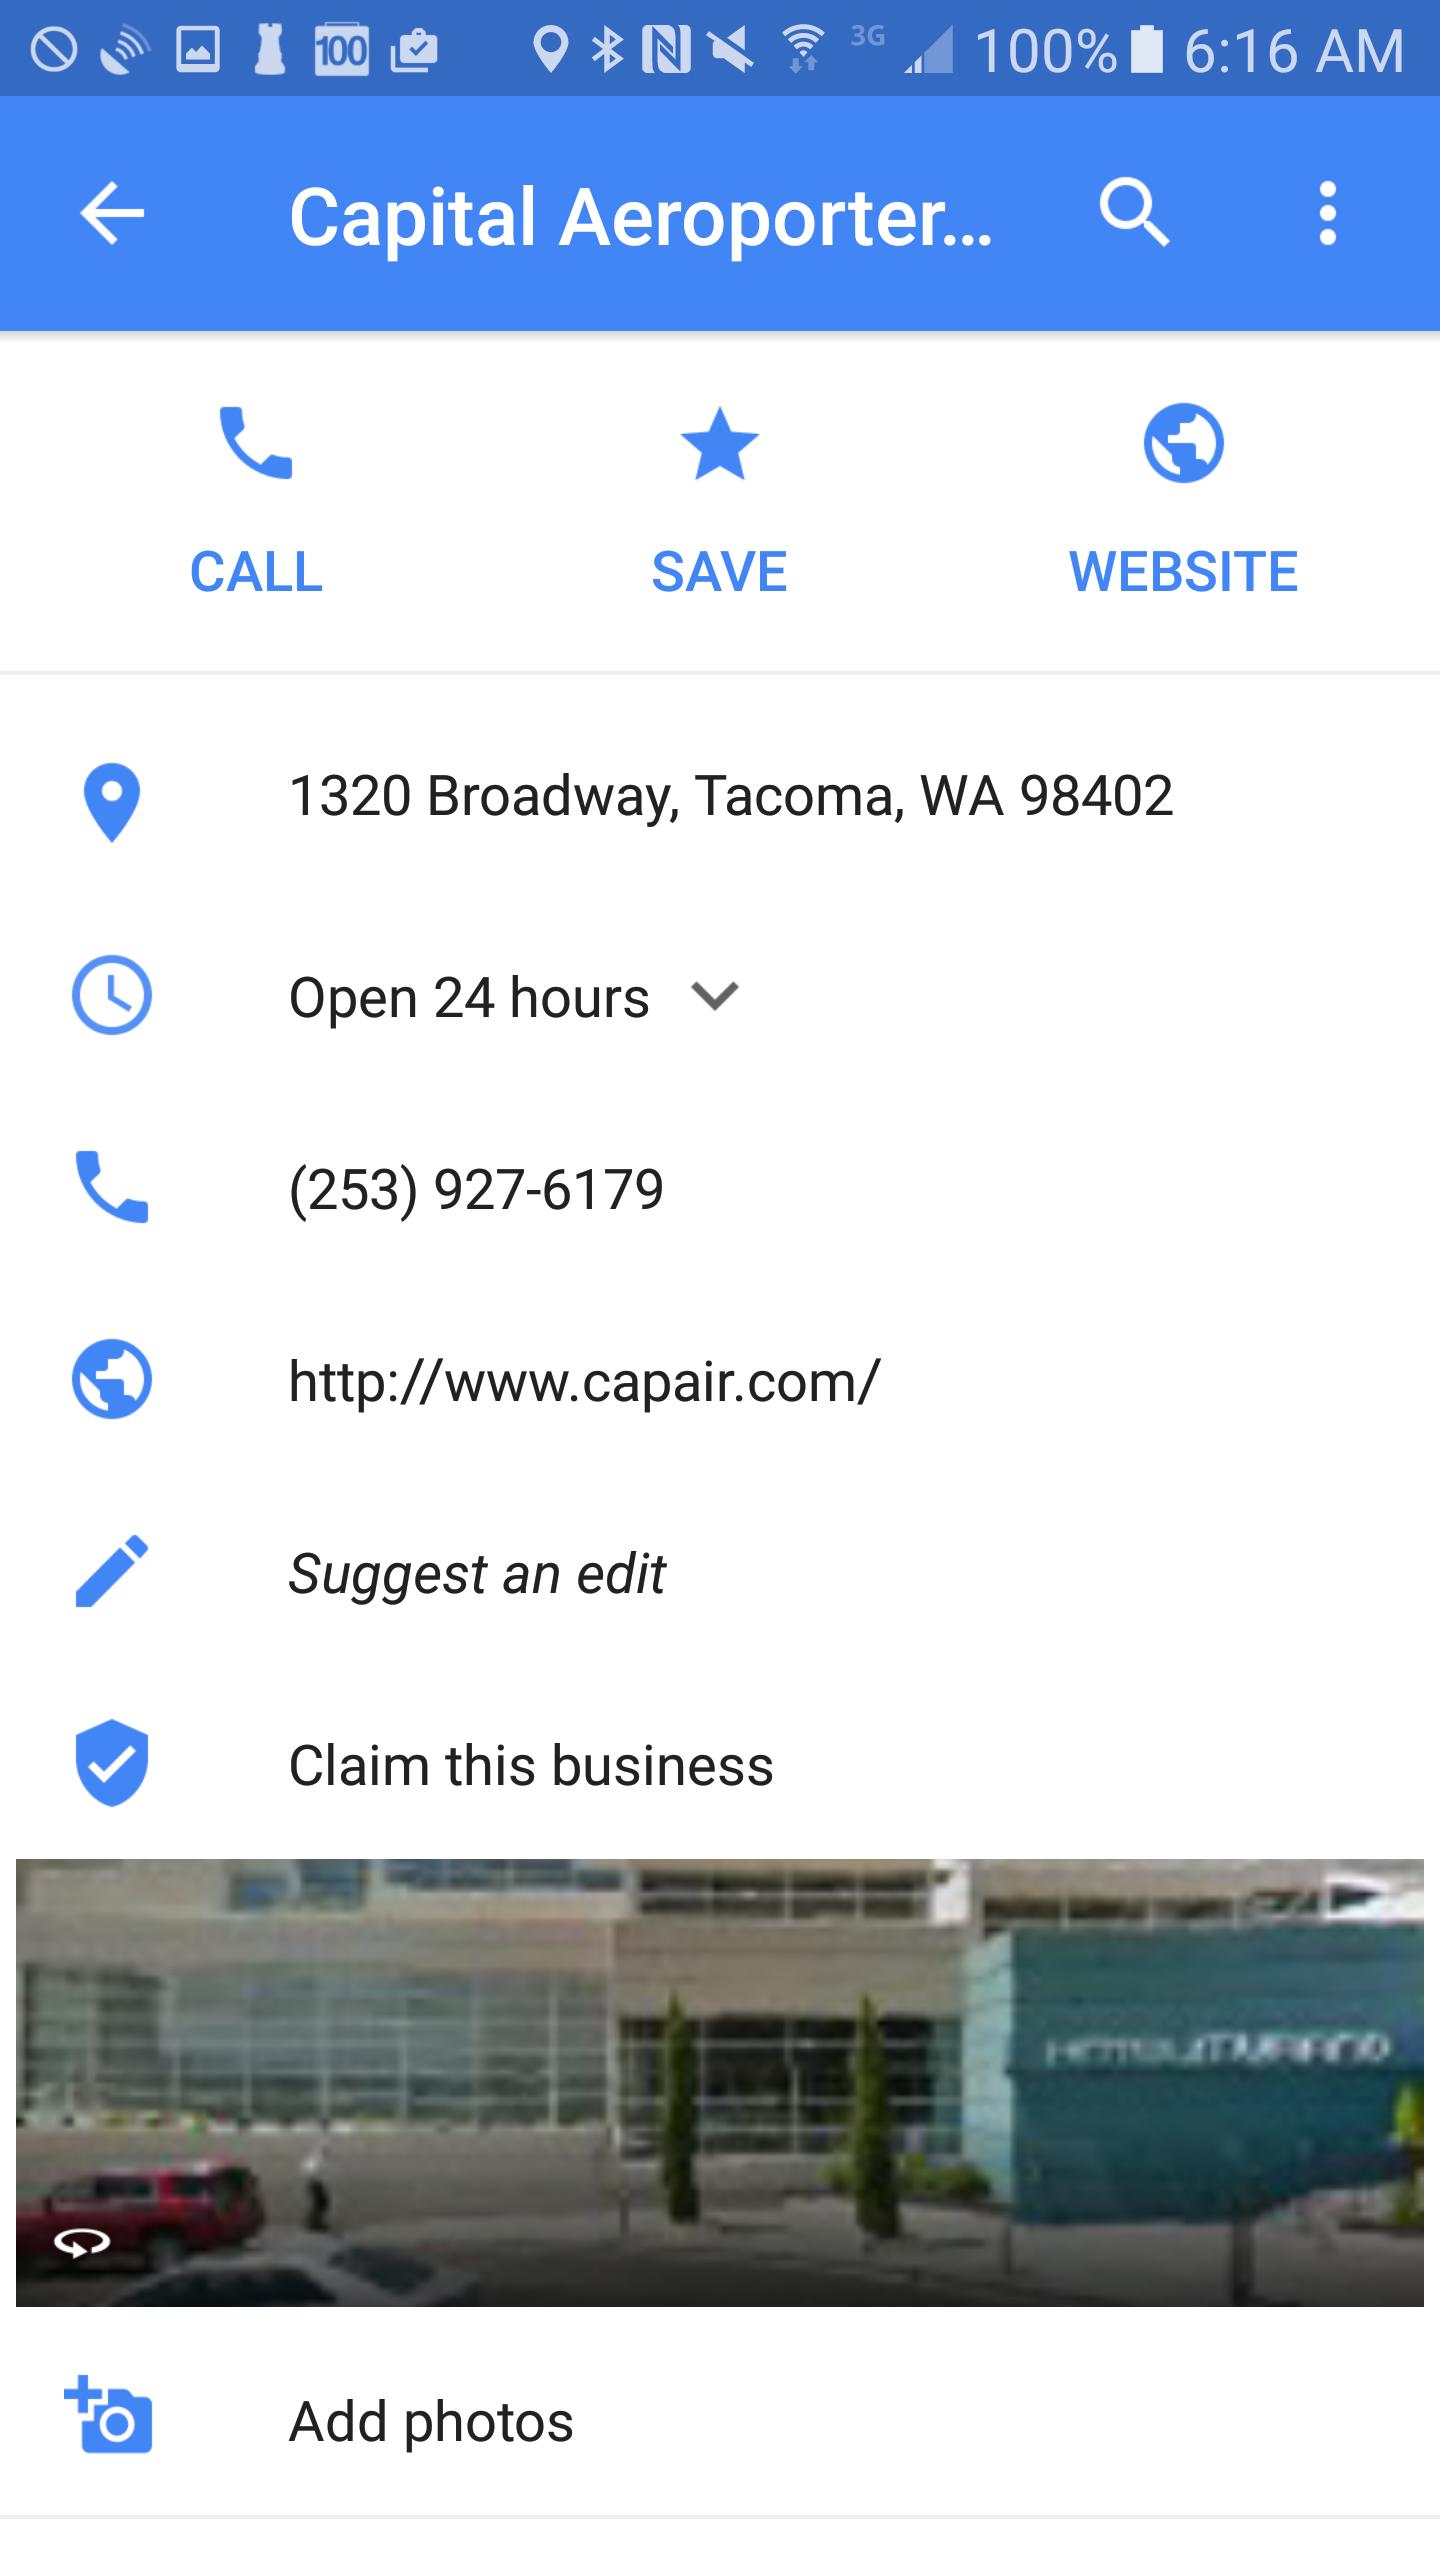 Google Maps Submission Not Applied - Google Maps Help on online maps, amazon fire phone maps, microsoft maps, waze maps, aeronautical maps, topographic maps, googie maps, ipad maps, stanford university maps, gppgle maps, road map usa states maps, aerial maps, android maps, googlr maps, goolge maps, iphone maps, search maps, bing maps, gogole maps, msn maps,